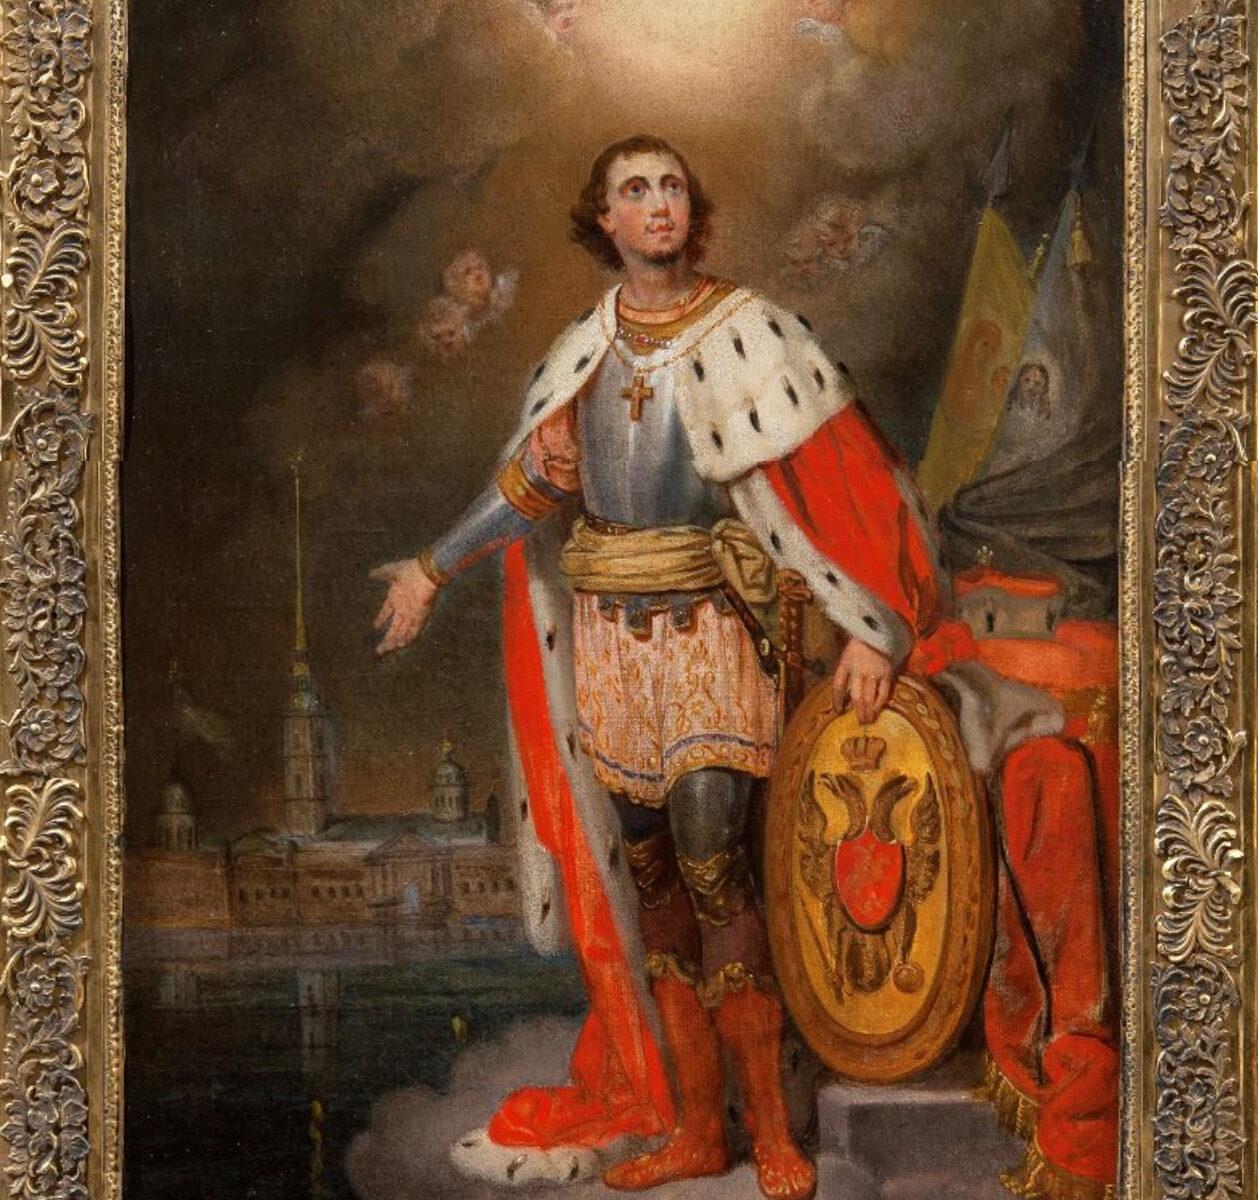 Икона «Благоверный князь Александр Невский» Холст, грунт, масло Начало 1840-х гг.